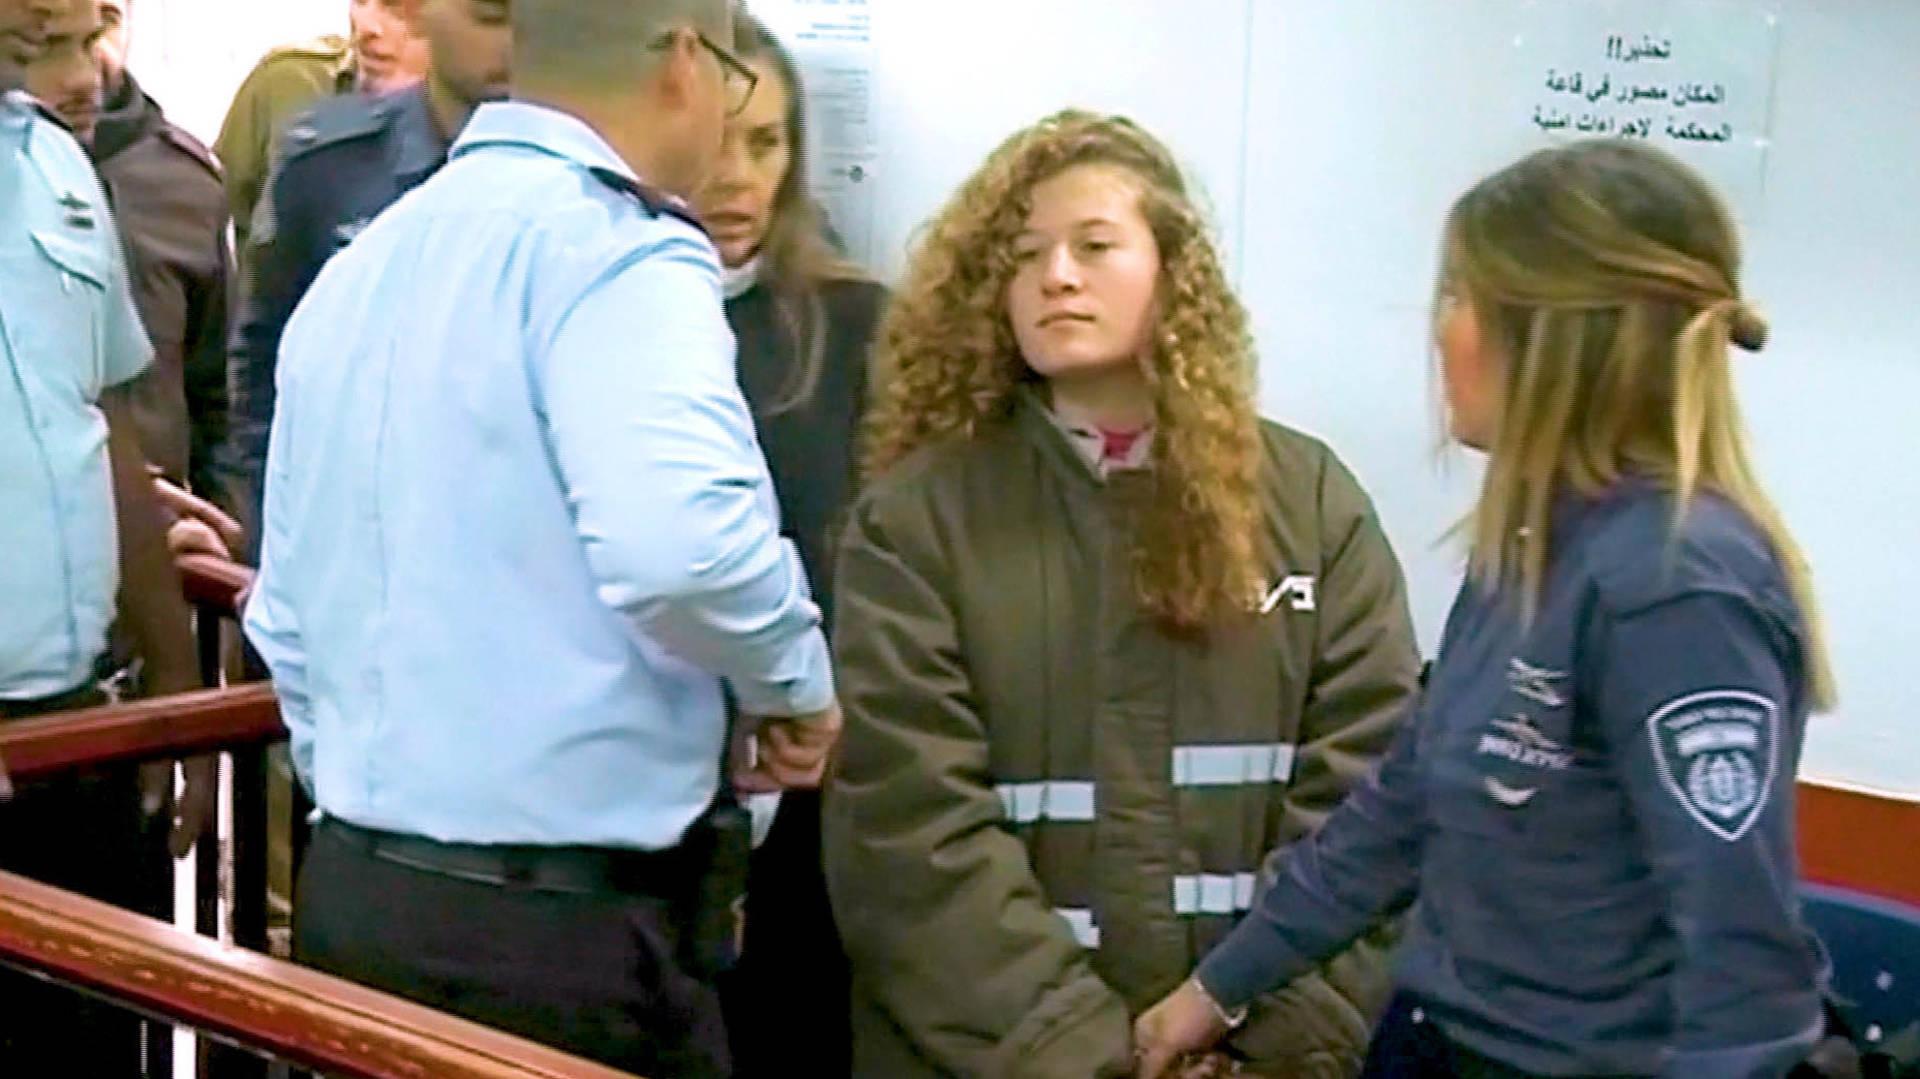 Israeli Judge Denies Bail to Palestinian Teen Who Slapped Soldier